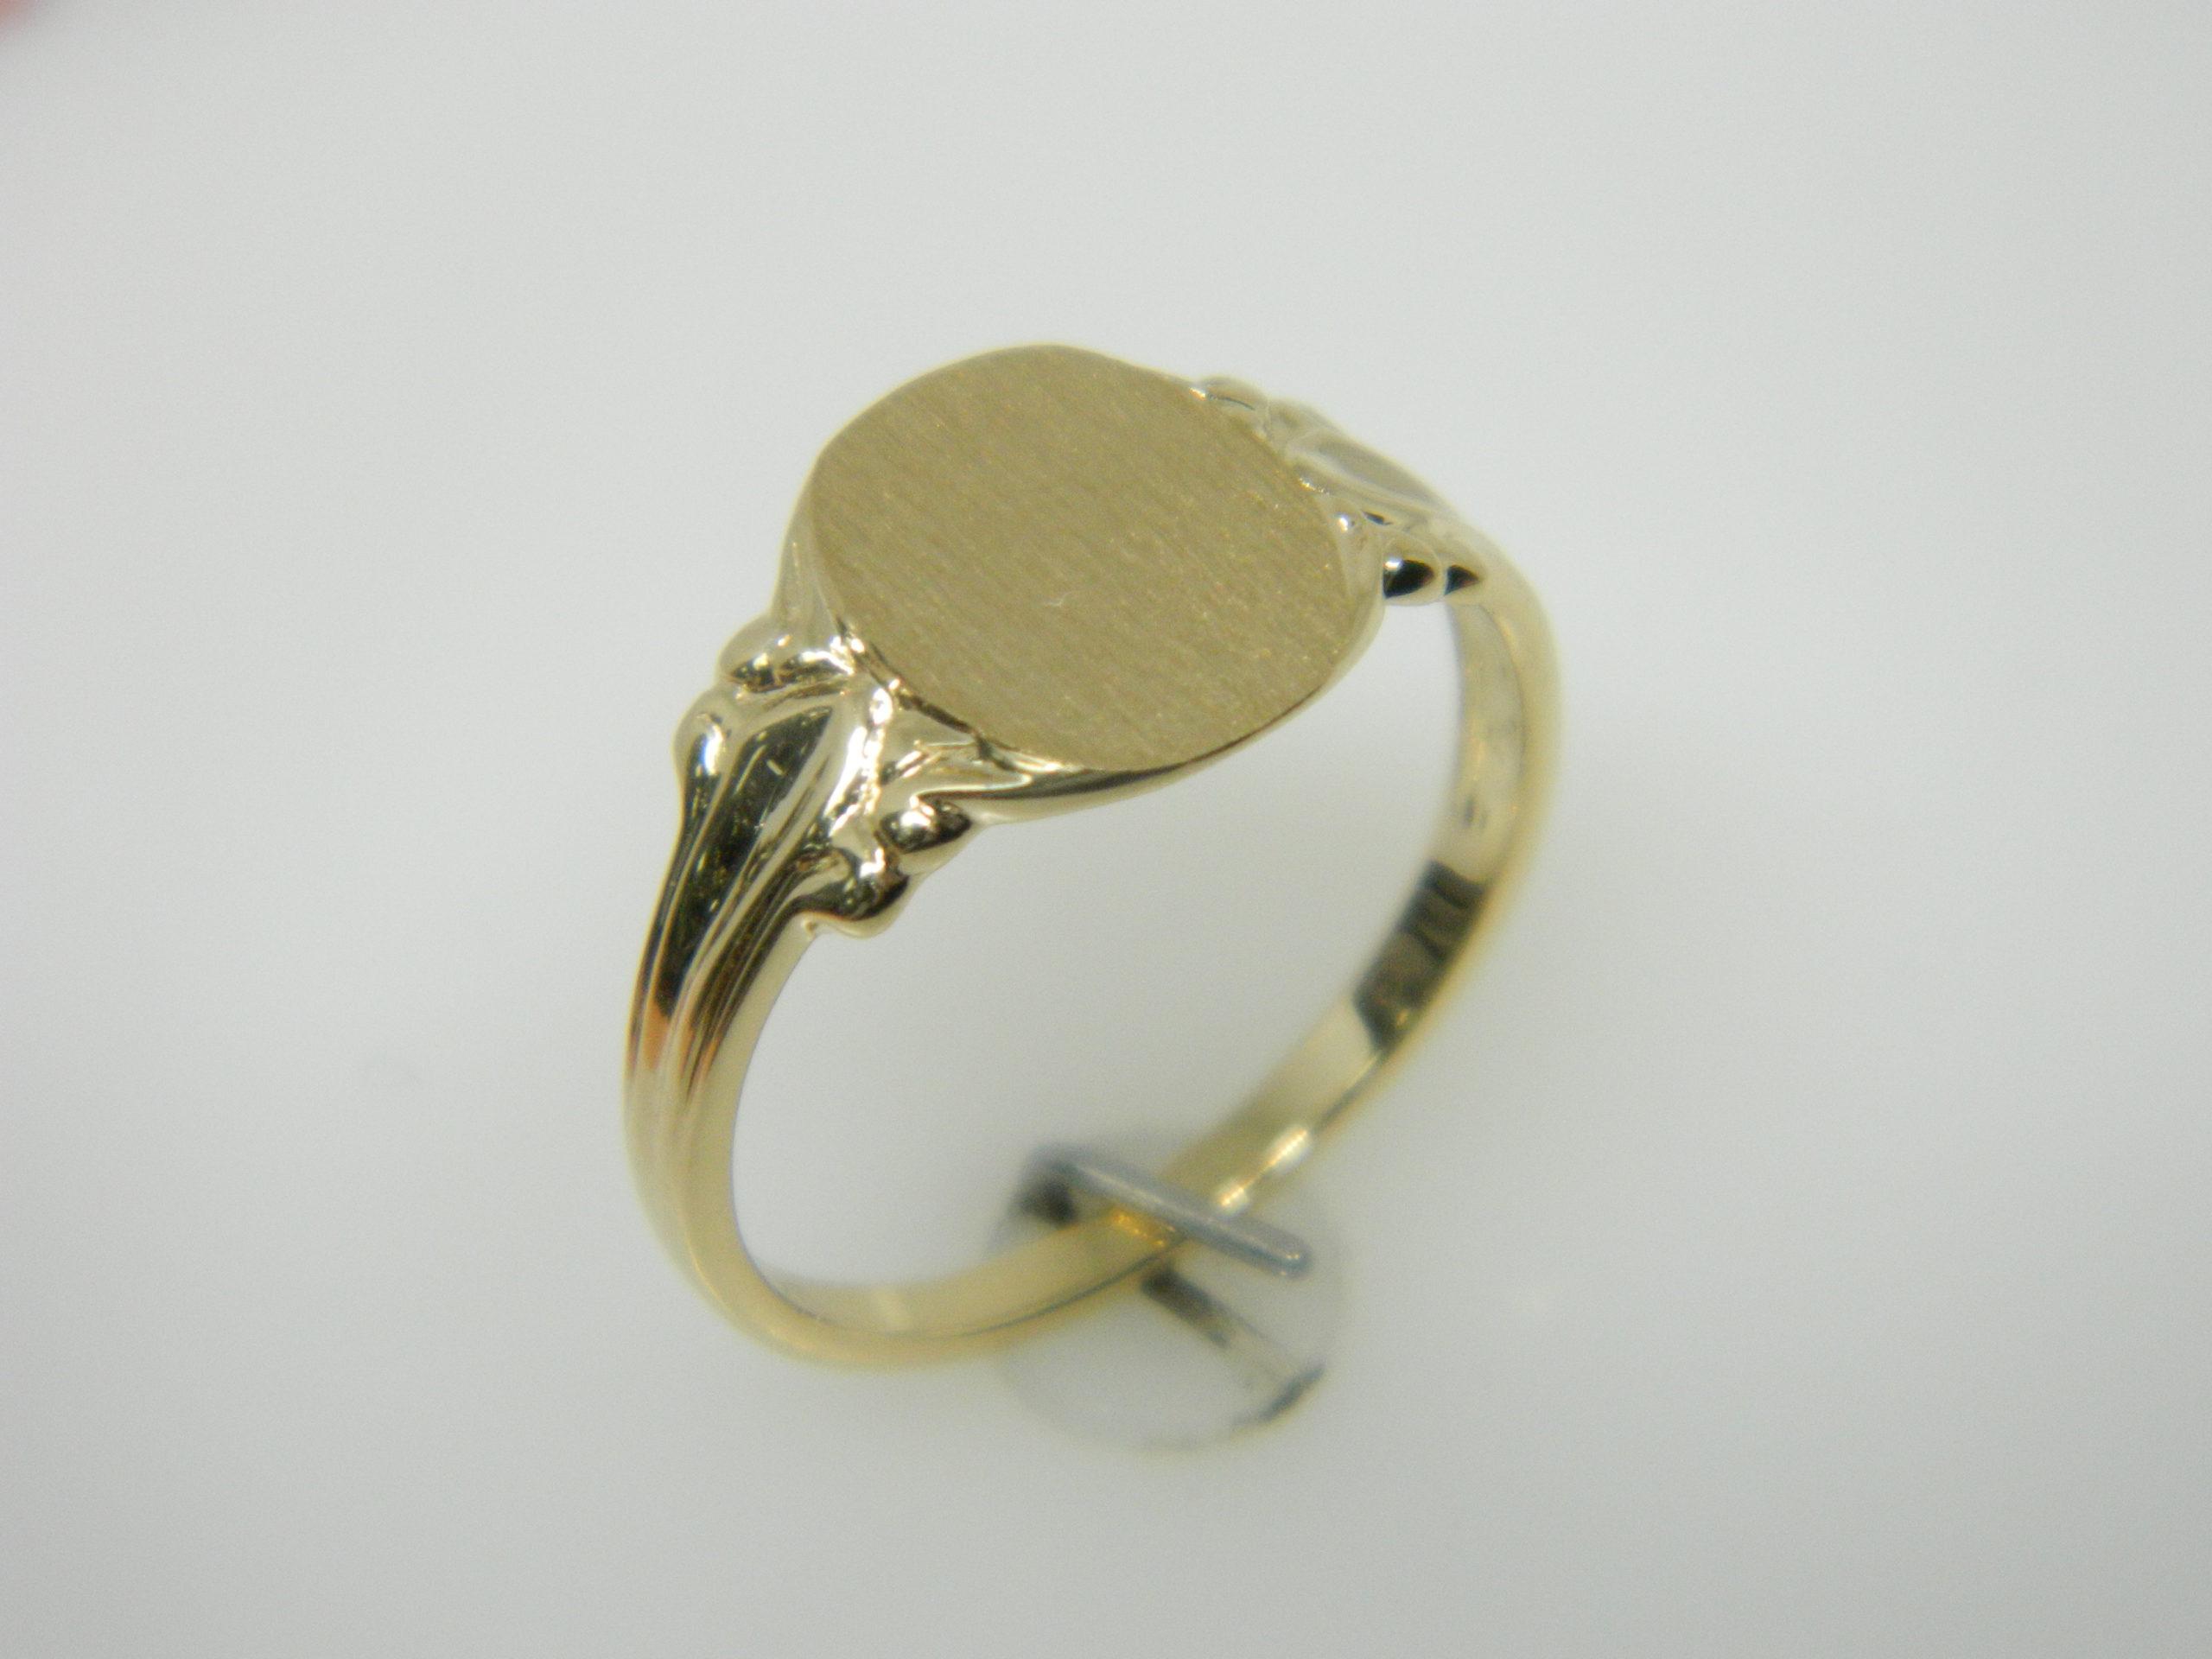 14 Karat Yellow Gold Bands Open Back Signet Ring- SZ6